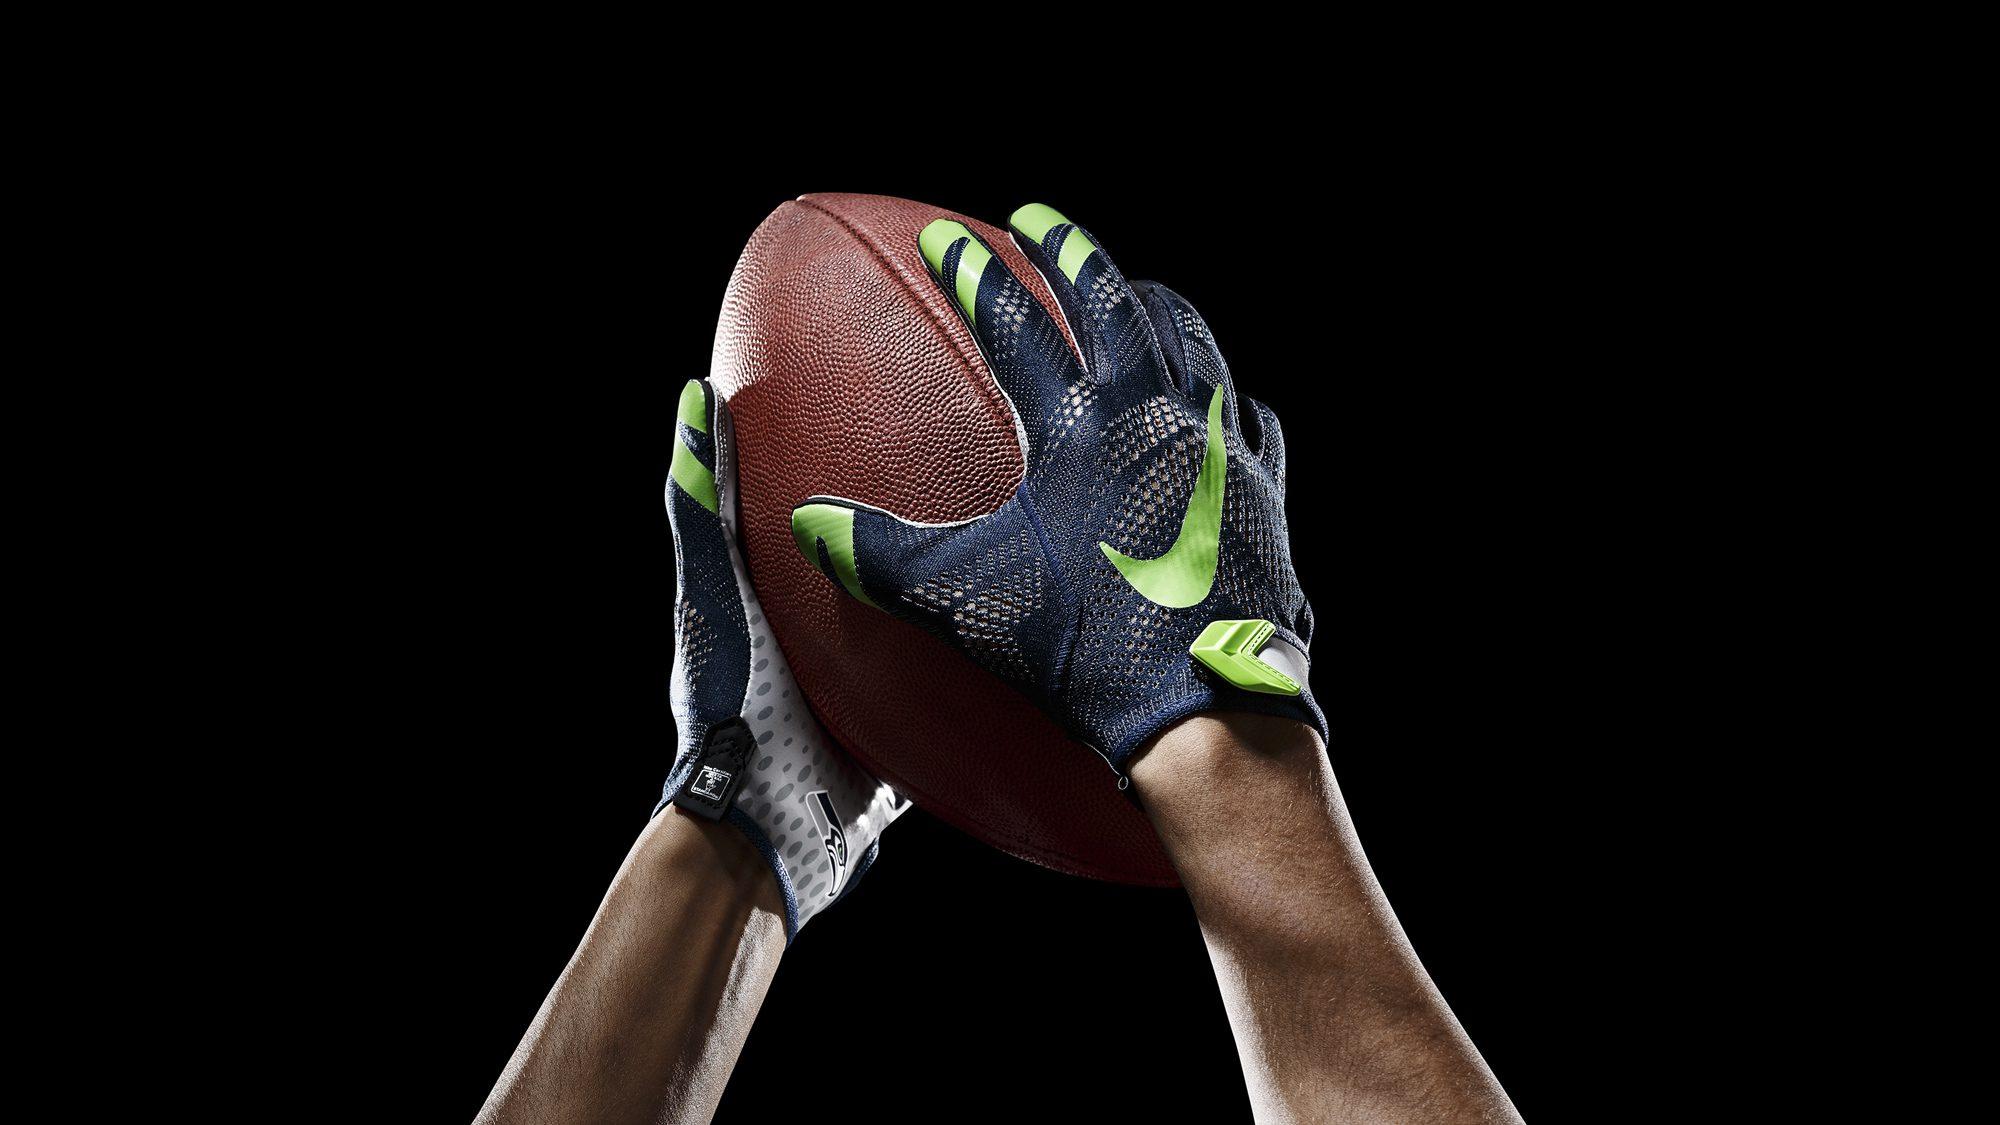 SP14_NFL_SB_TeamGloves_Ball_Seahawks_36851